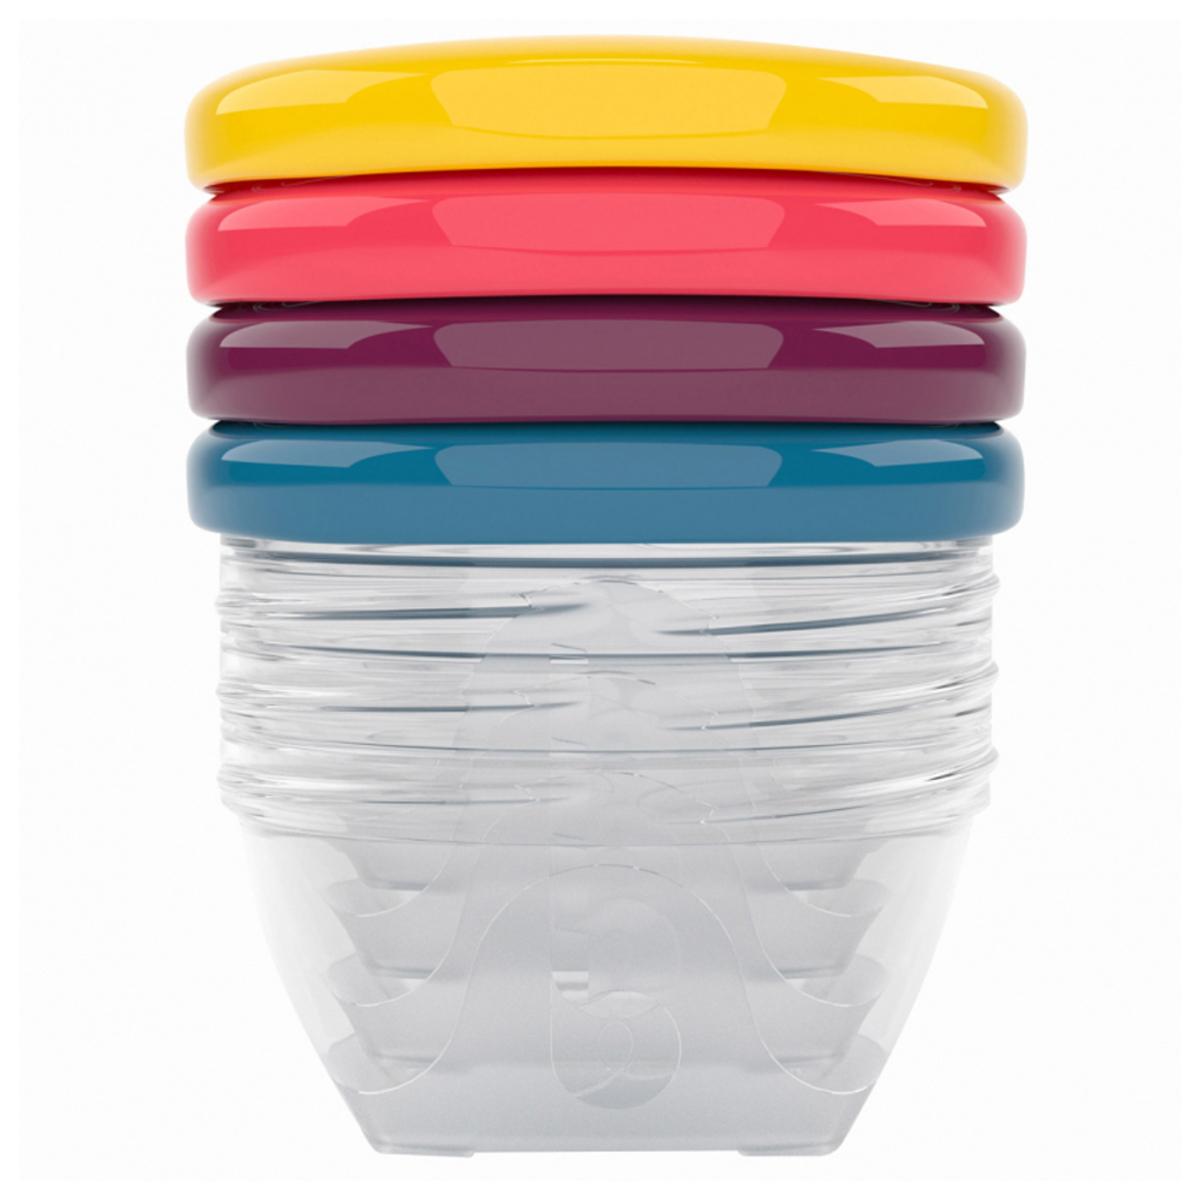 Vaisselle & Couvert Lot de 4 Babybols - 120 ml Lot de 4 Babybols - 120 ml